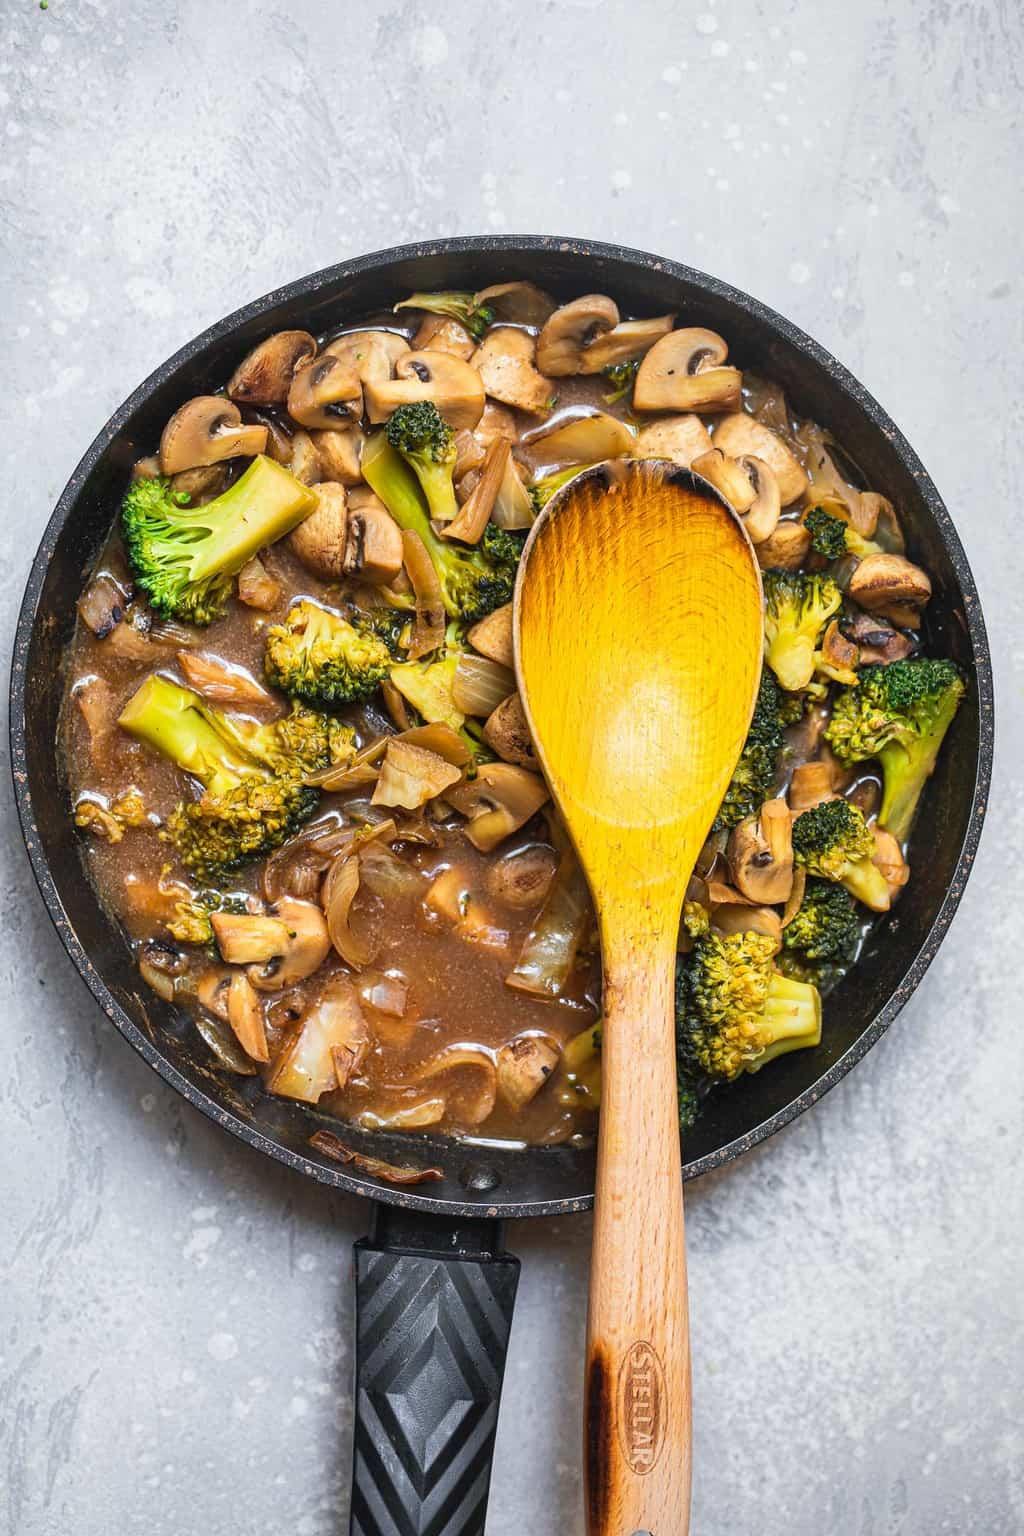 Broccoli soup in a saucepan